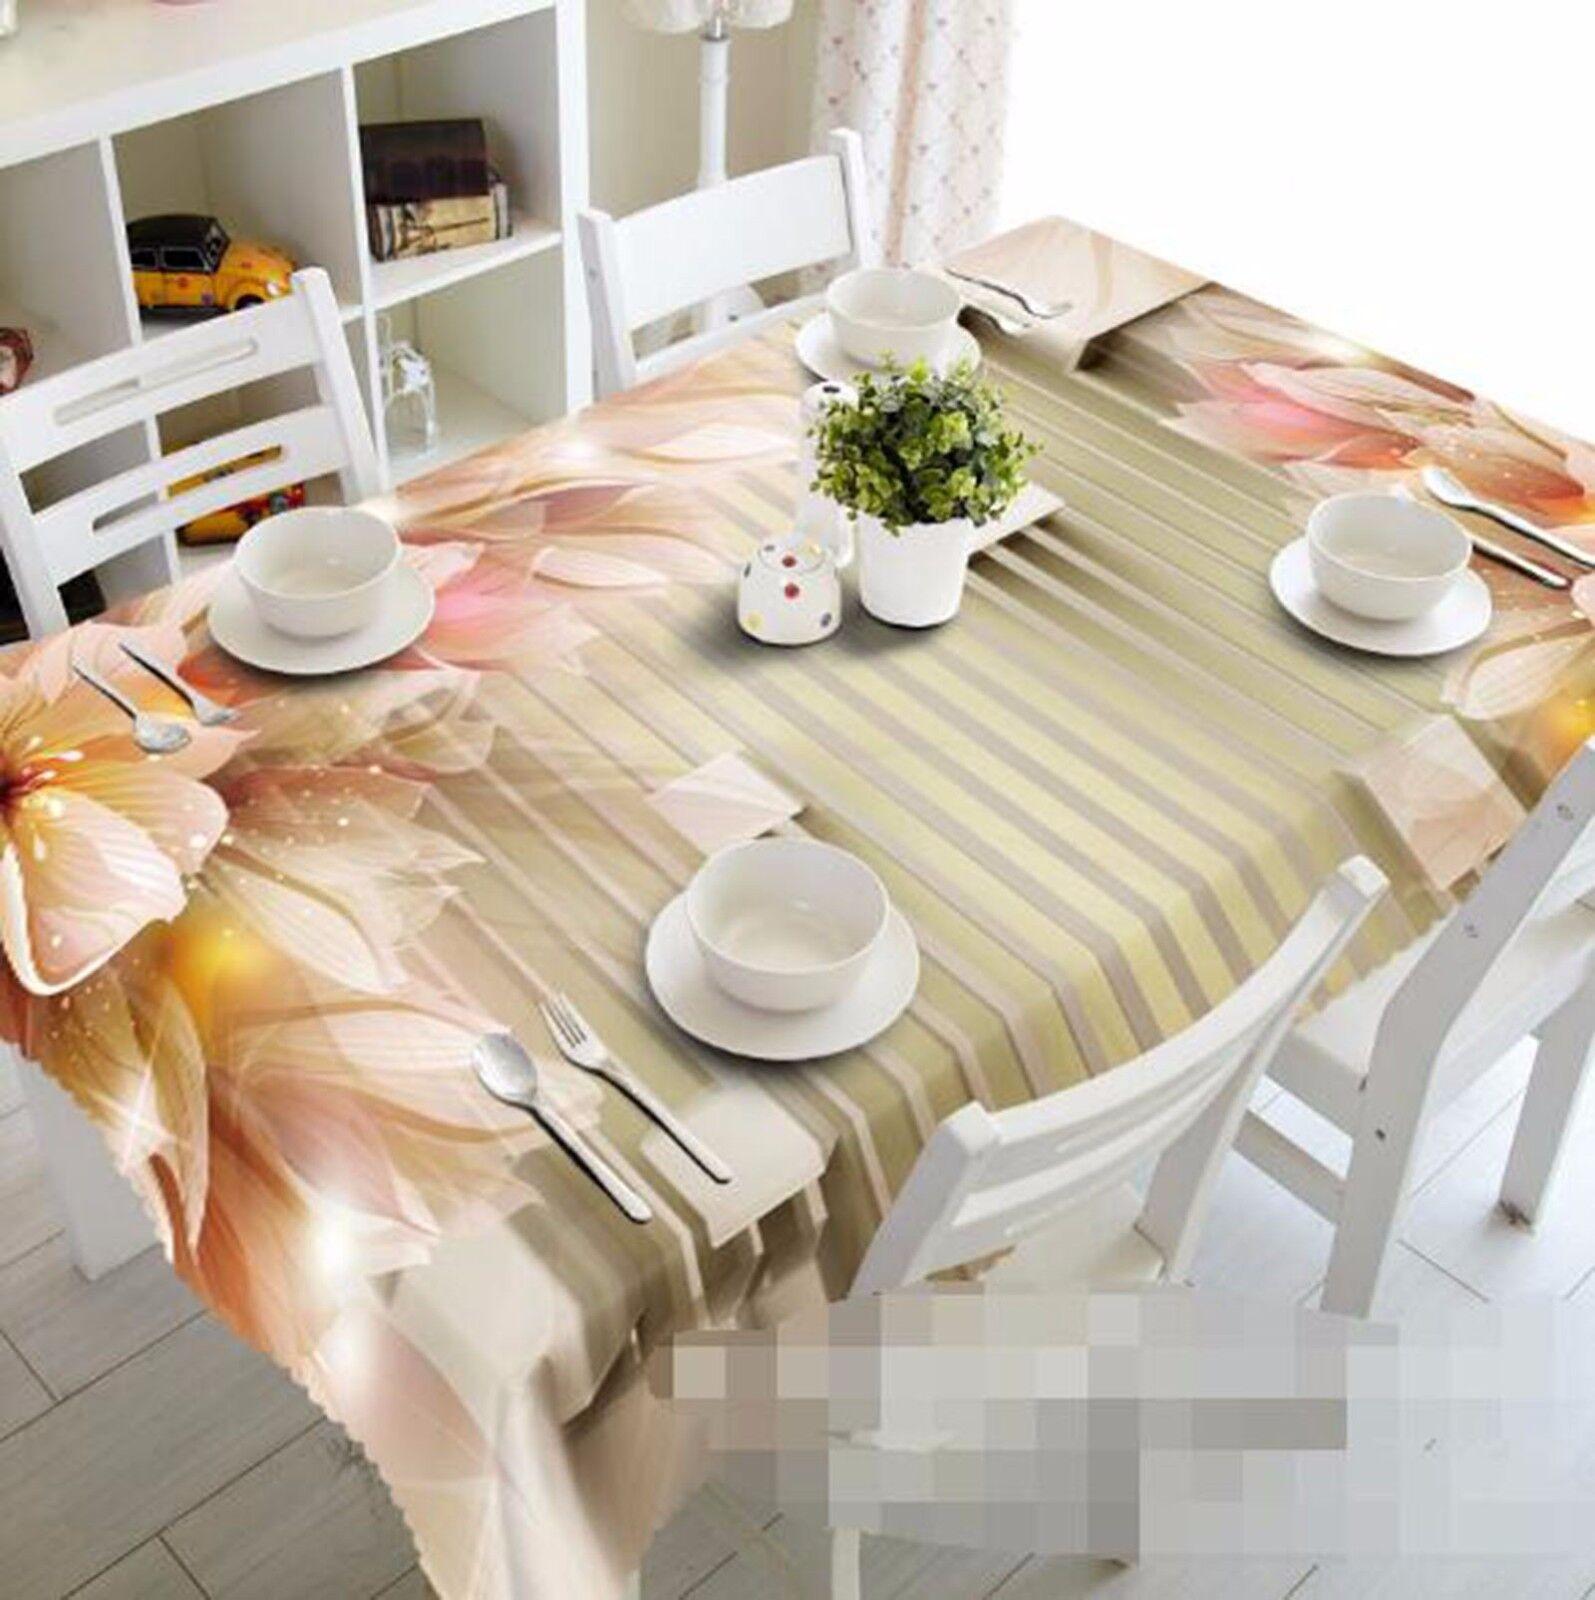 3D Petals 436 Tablecloth Table Cover Cloth Birthday Party AJ WALLPAPER UK Lemon